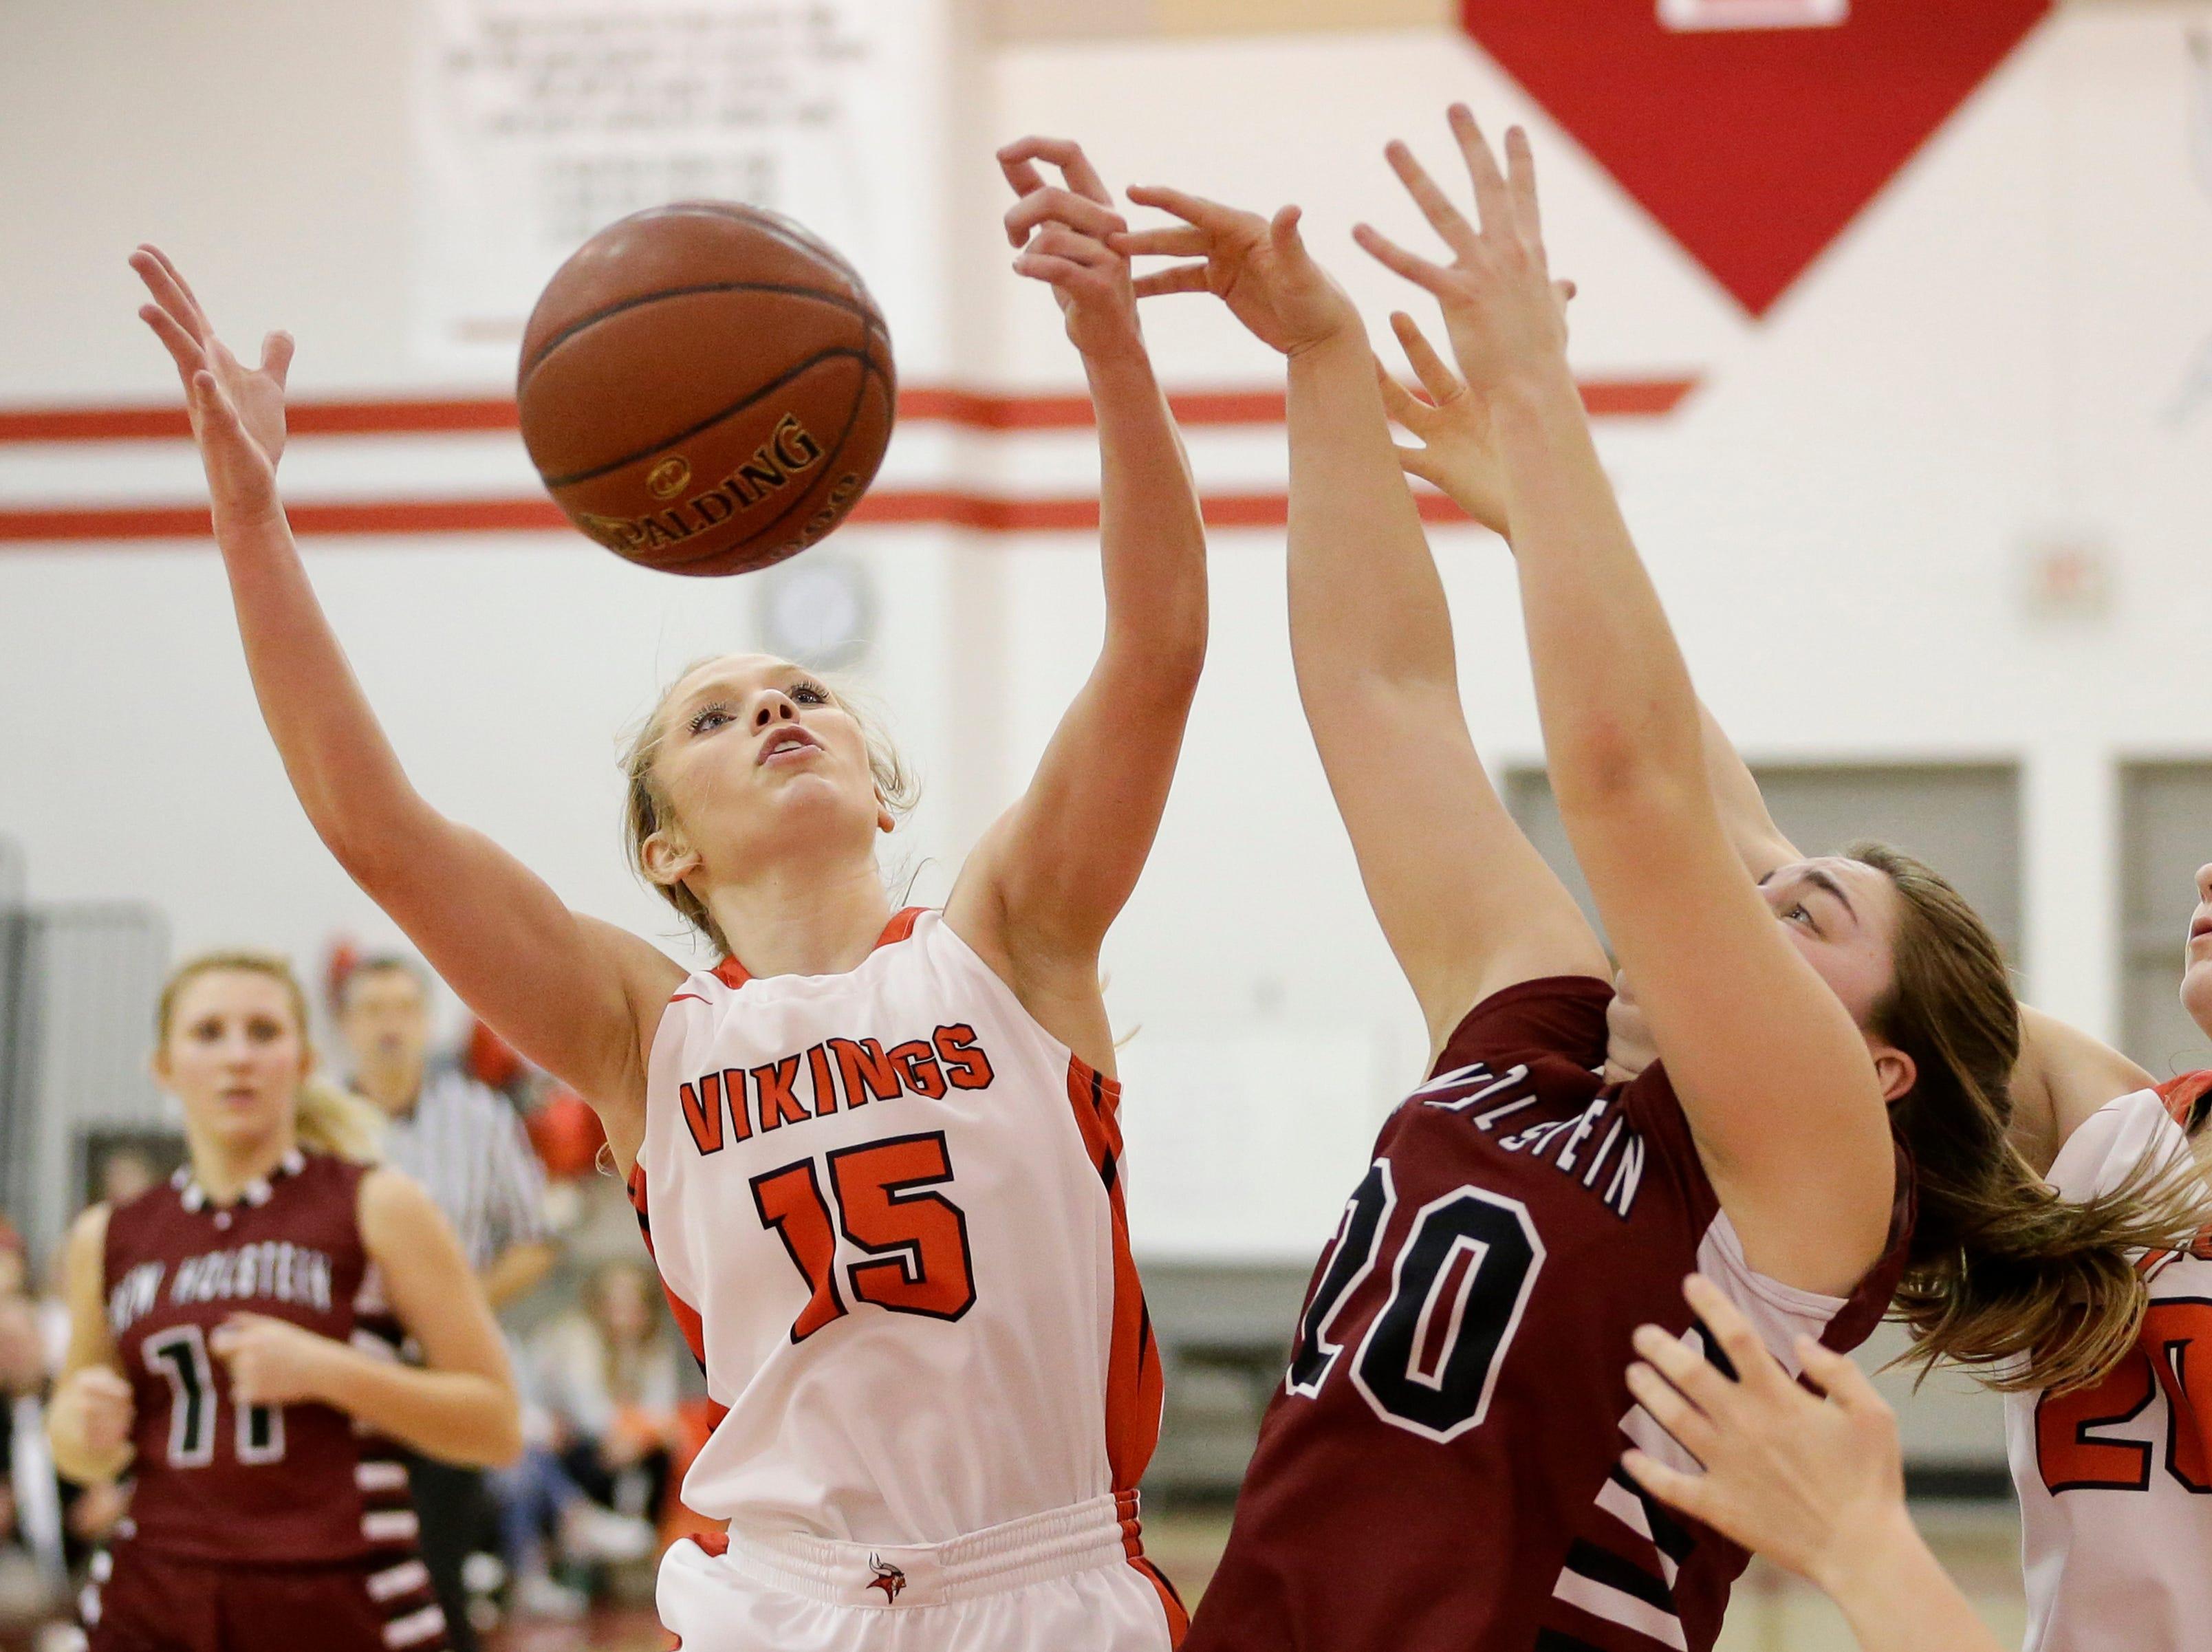 Valders' Jenna Evenson (15) battles New Holstein's Mackenzie Doherty (20) for a rebound at Valders High School Friday, February 8, 2019, in Valders, Wis. Joshua Clark/USA TODAY NETWORK-Wisconsin